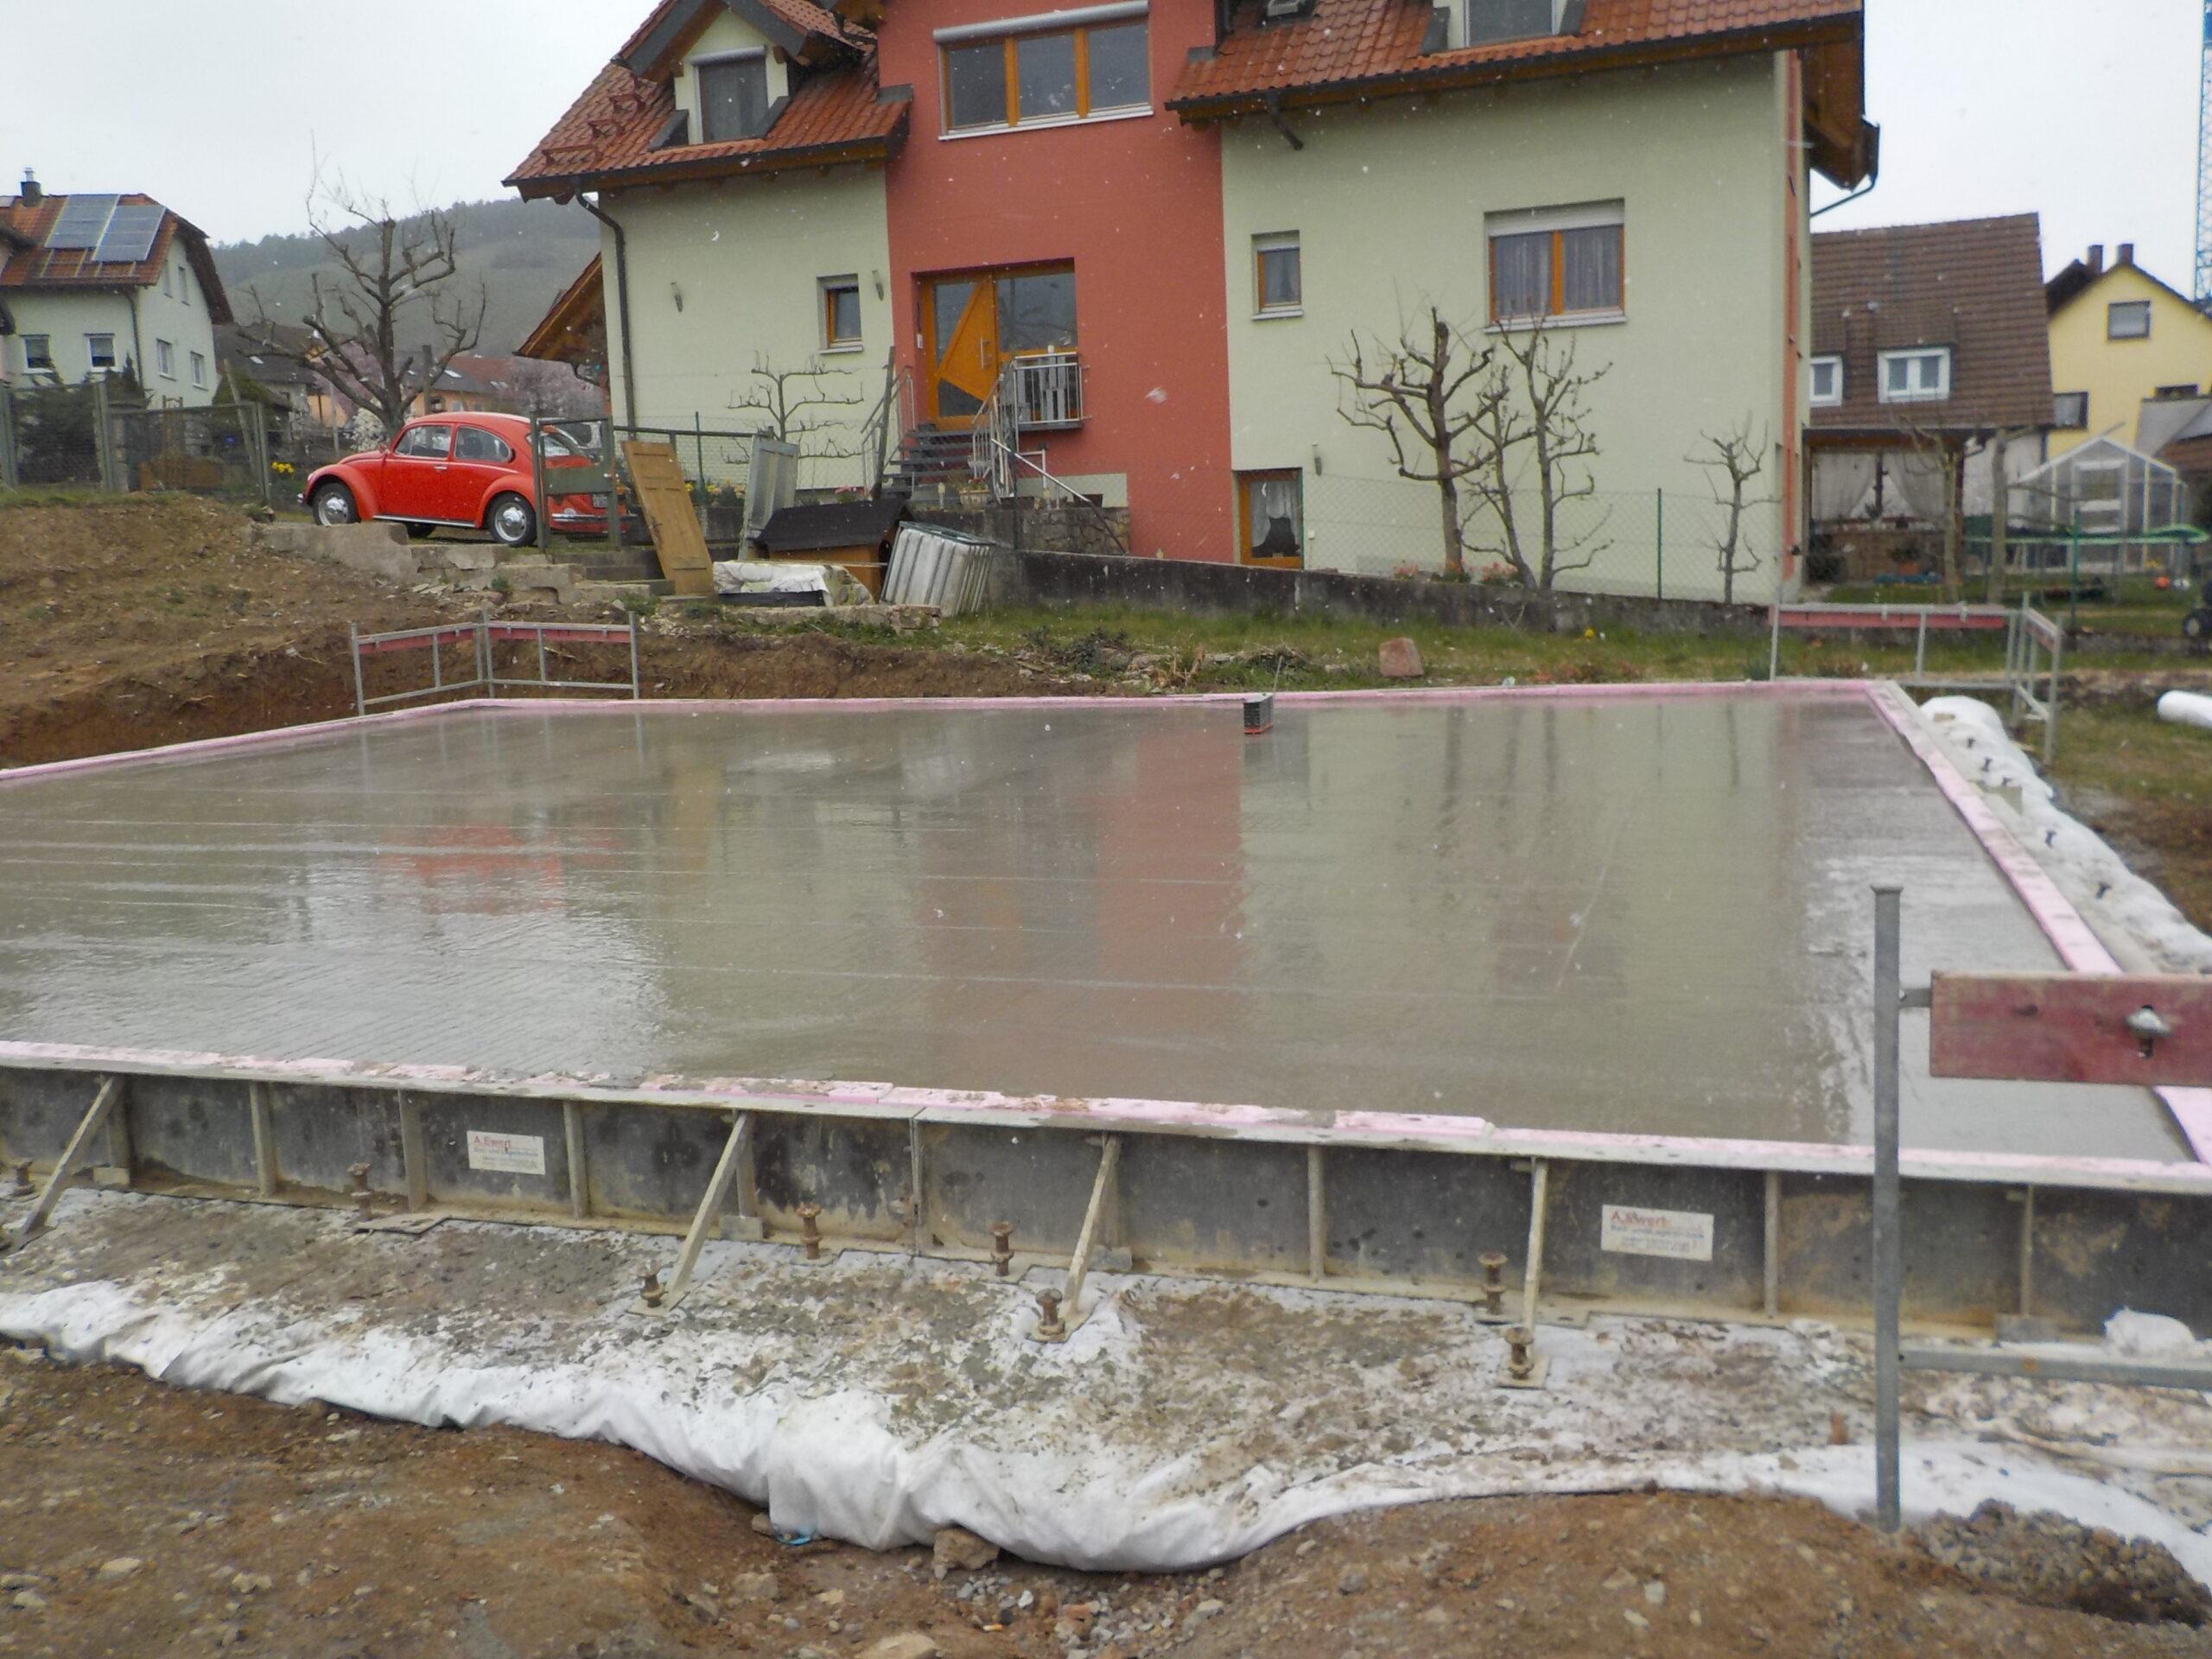 Bodenplatte - Graf-Rieneck-Strasse 20 - Erlabrunn (2)